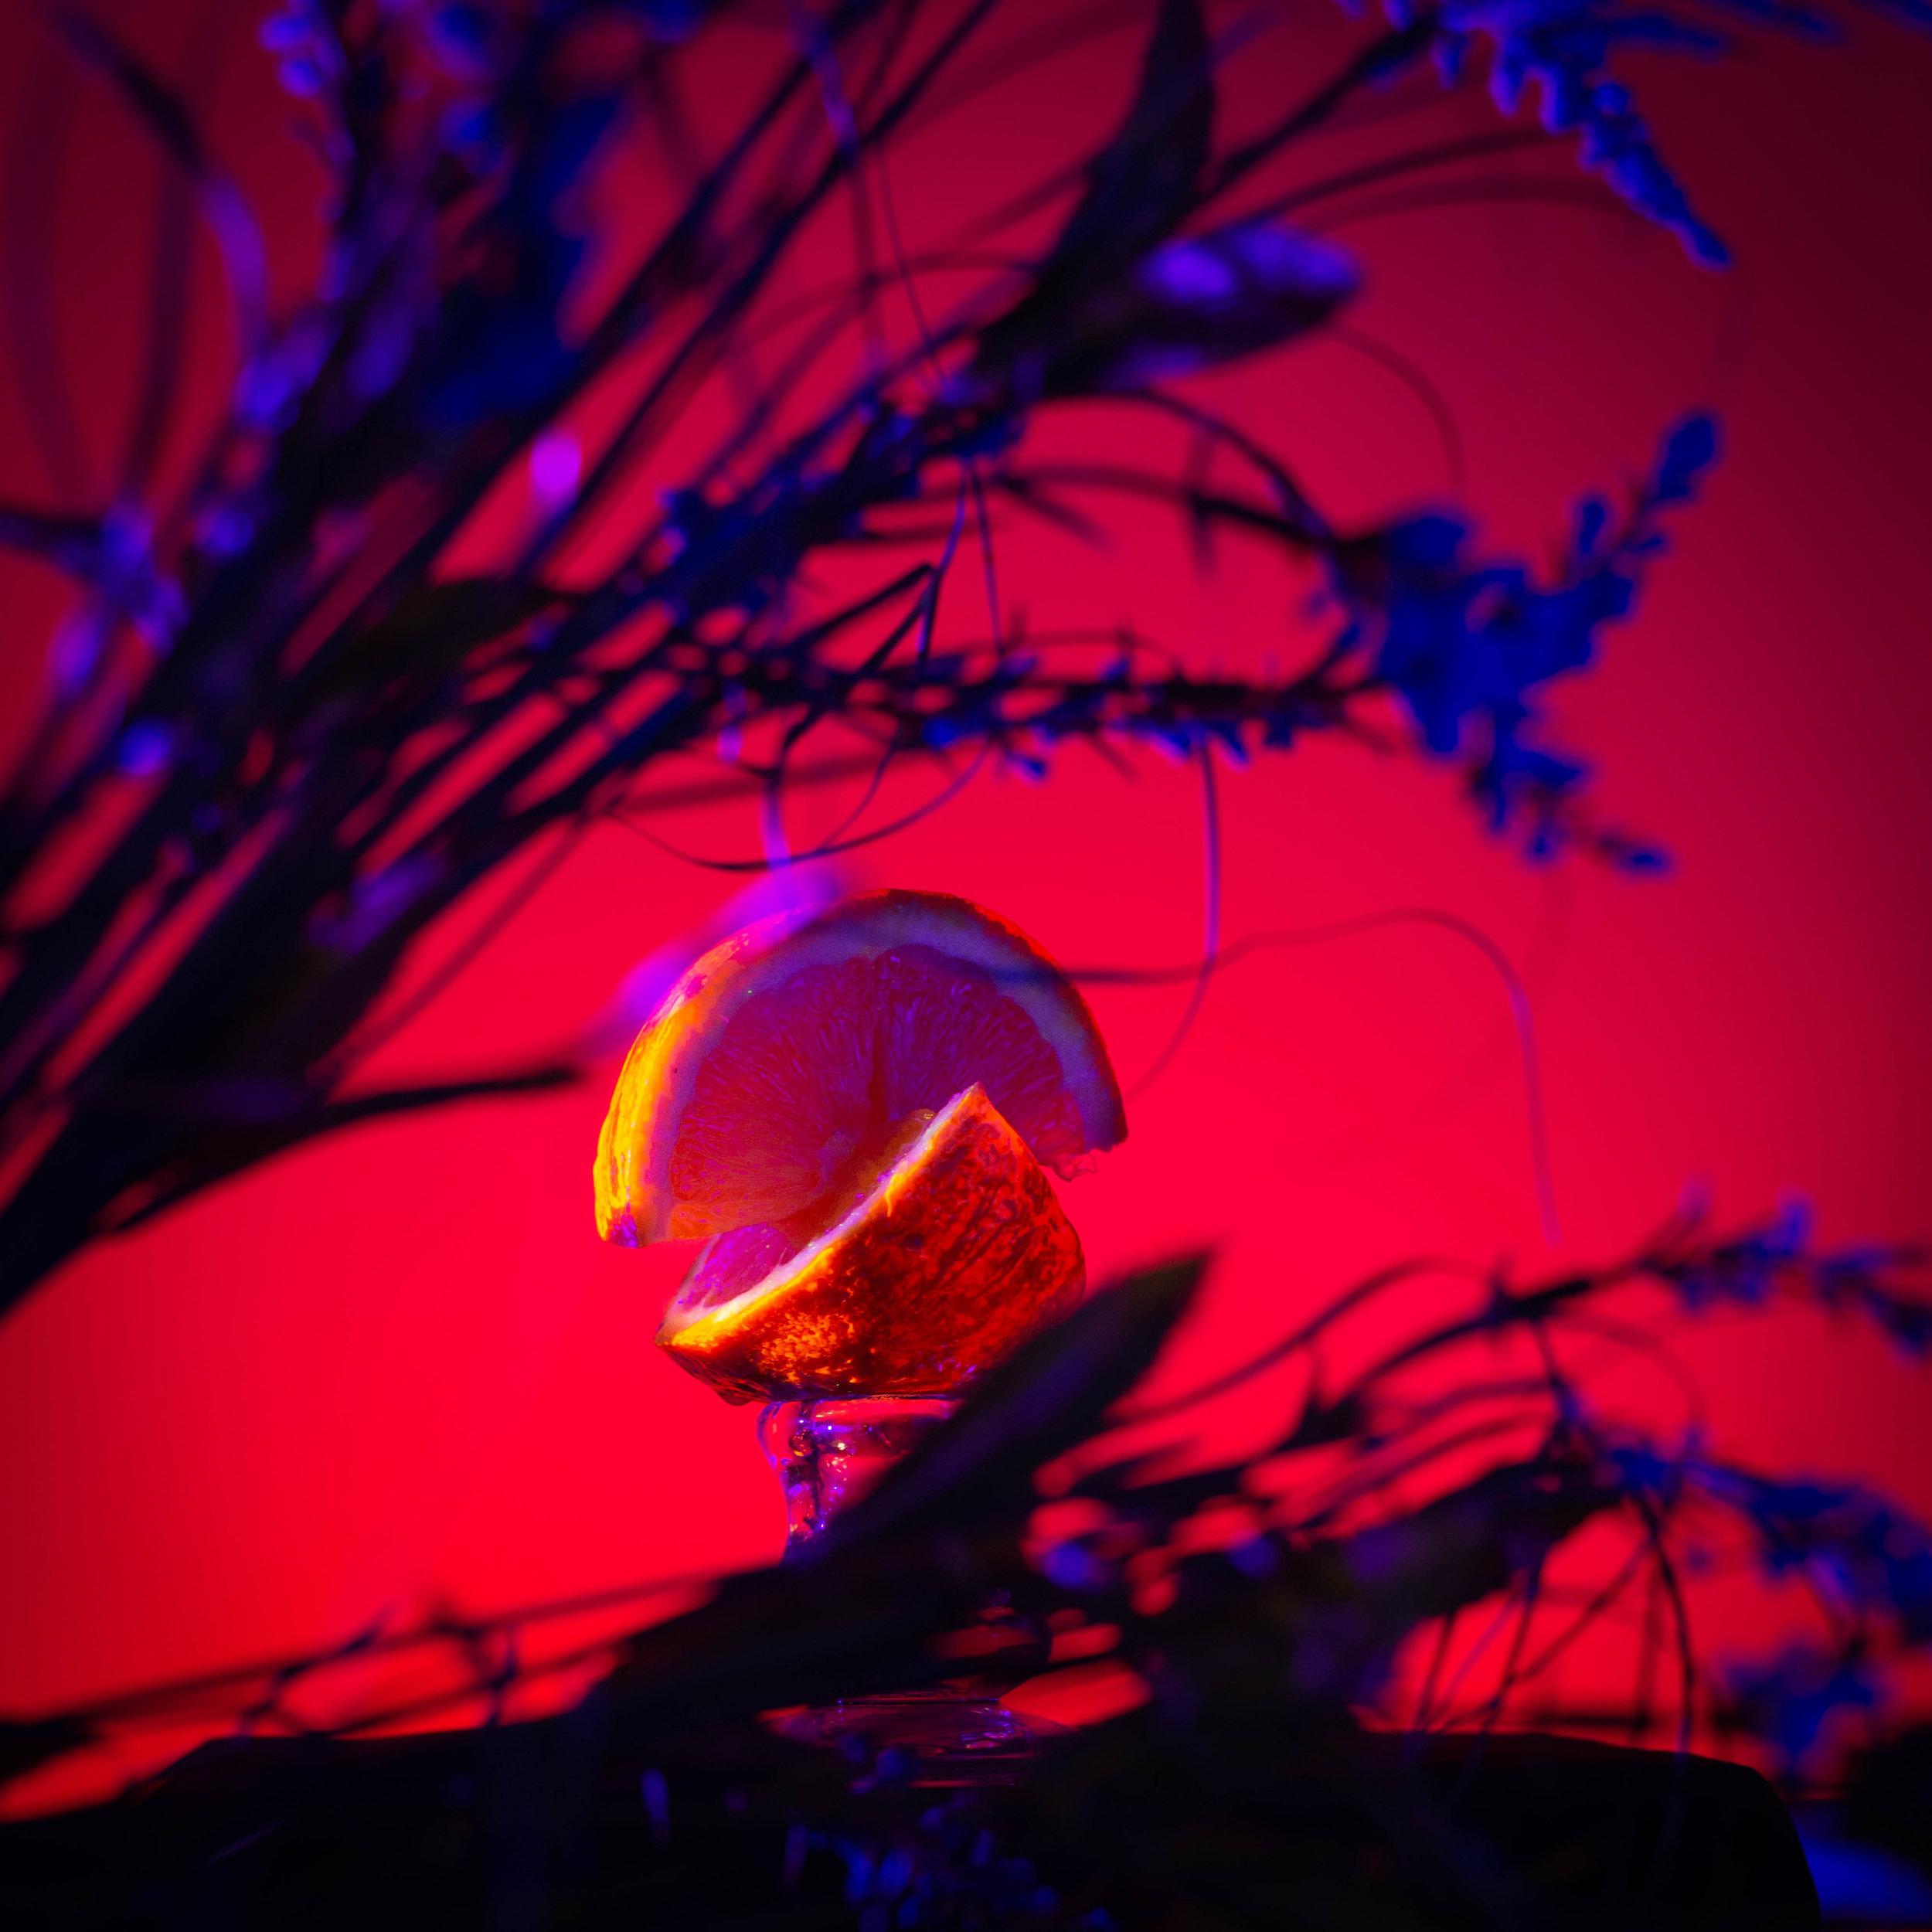 UV-Photography-5.jpg